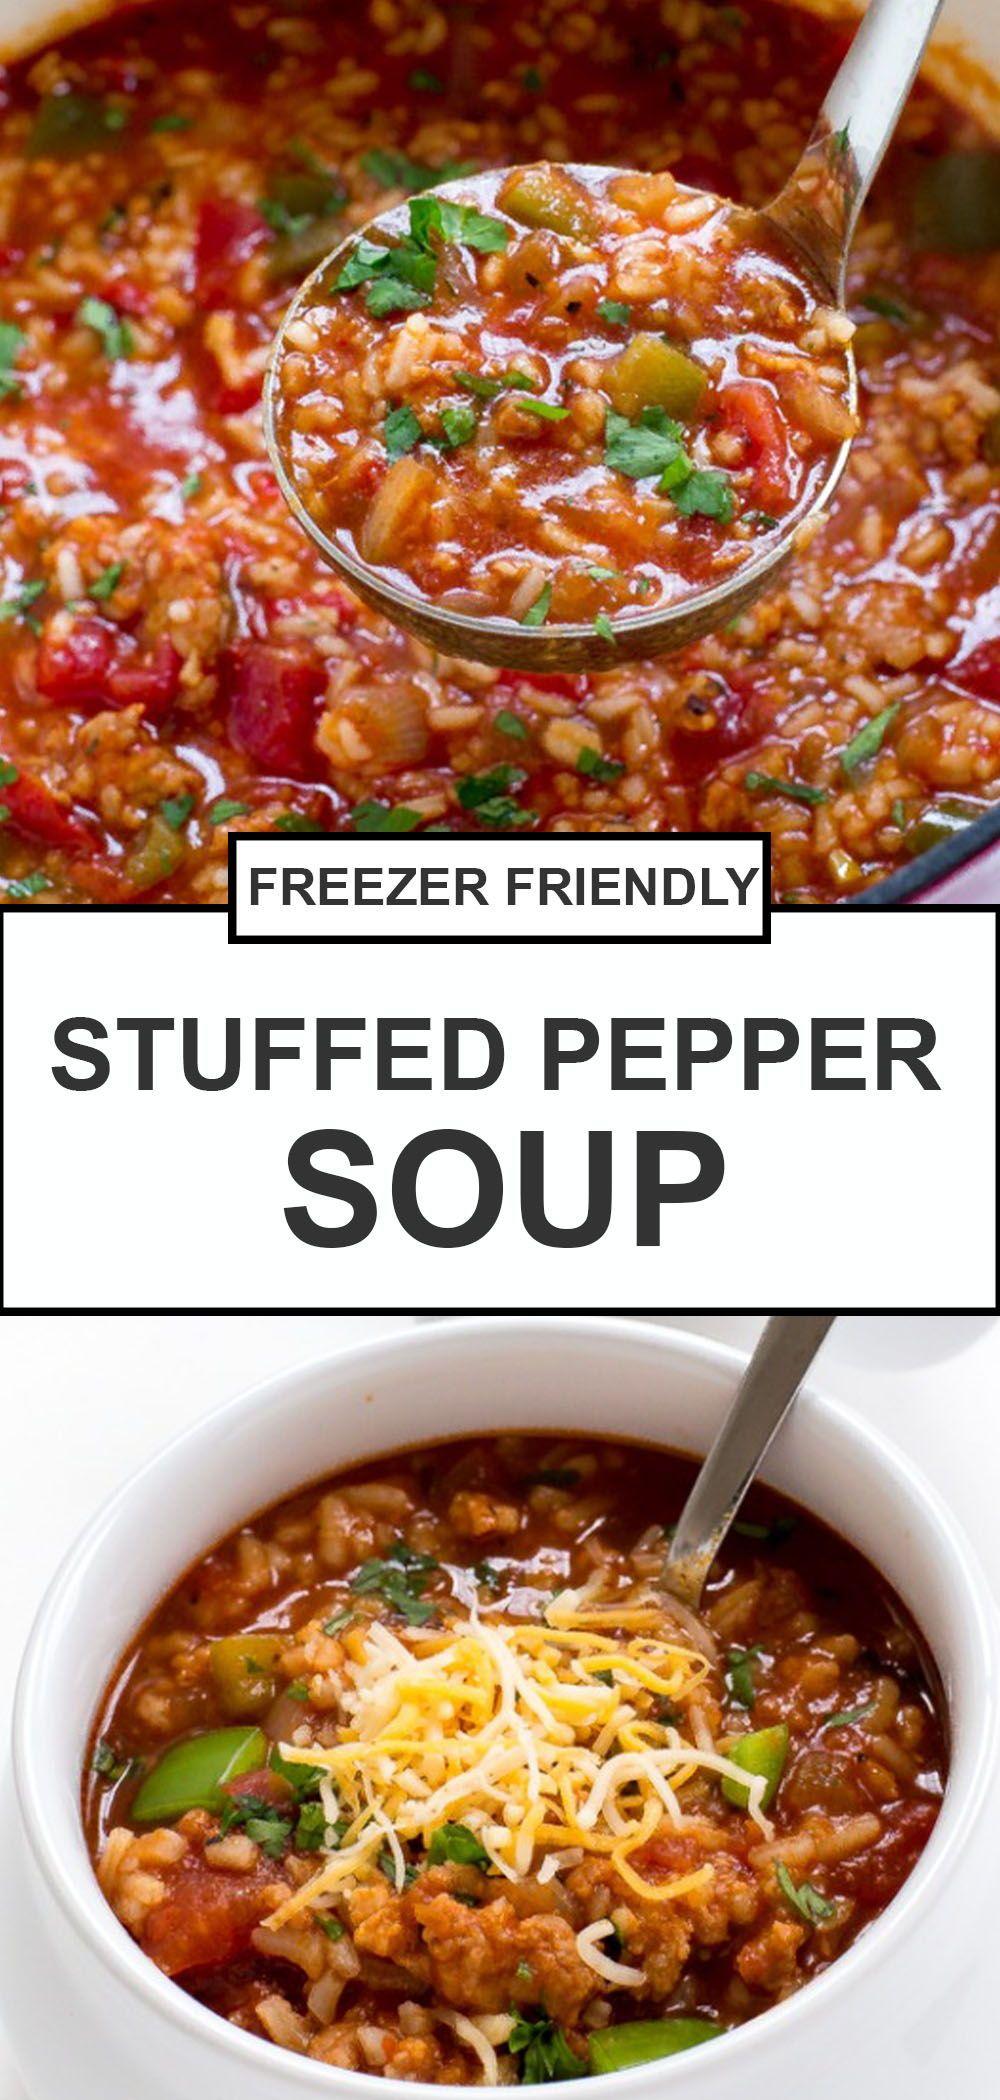 Easy Stuffed Pepper Soup Recipe One Pot Chef Savvy Recipe In 2020 Stuffed Pepper Soup Healthy Beef Recipes Stuffed Peppers